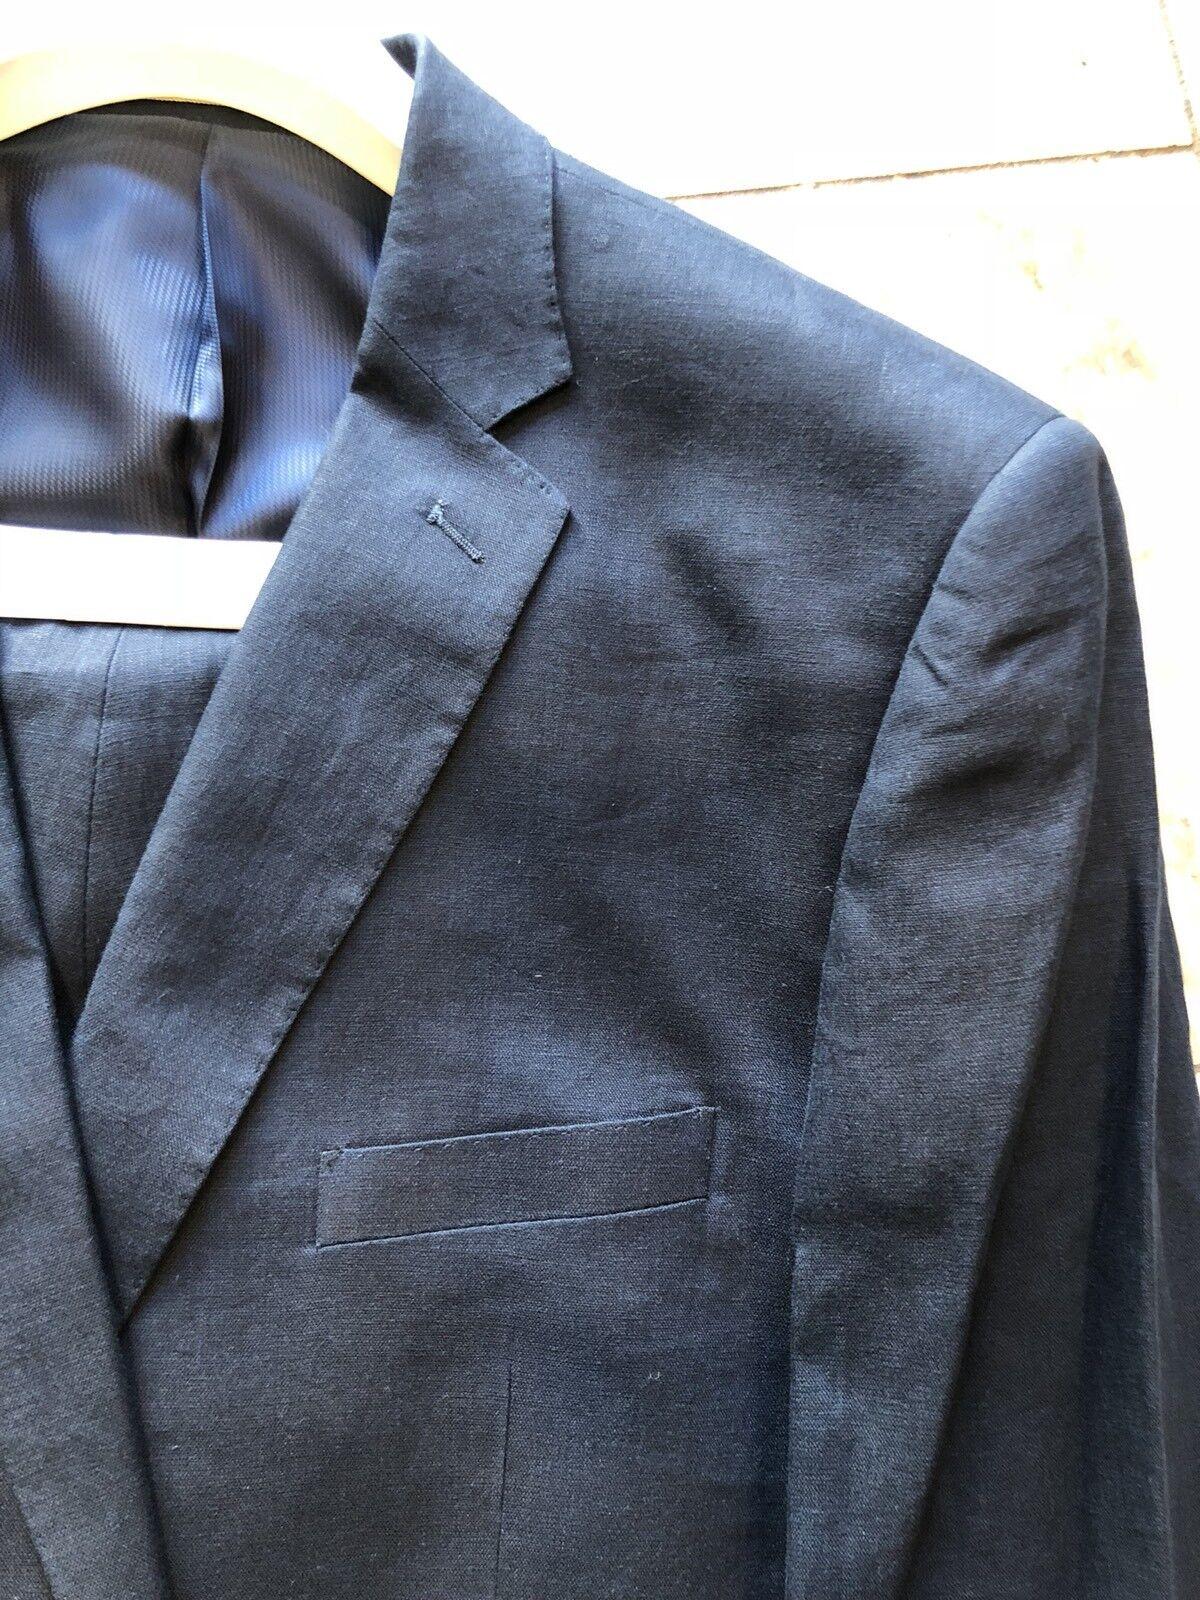 NWT APOLLO KING Classic Fit Men's 100% Linen Suit Lined Navy color 2BT Size 46R